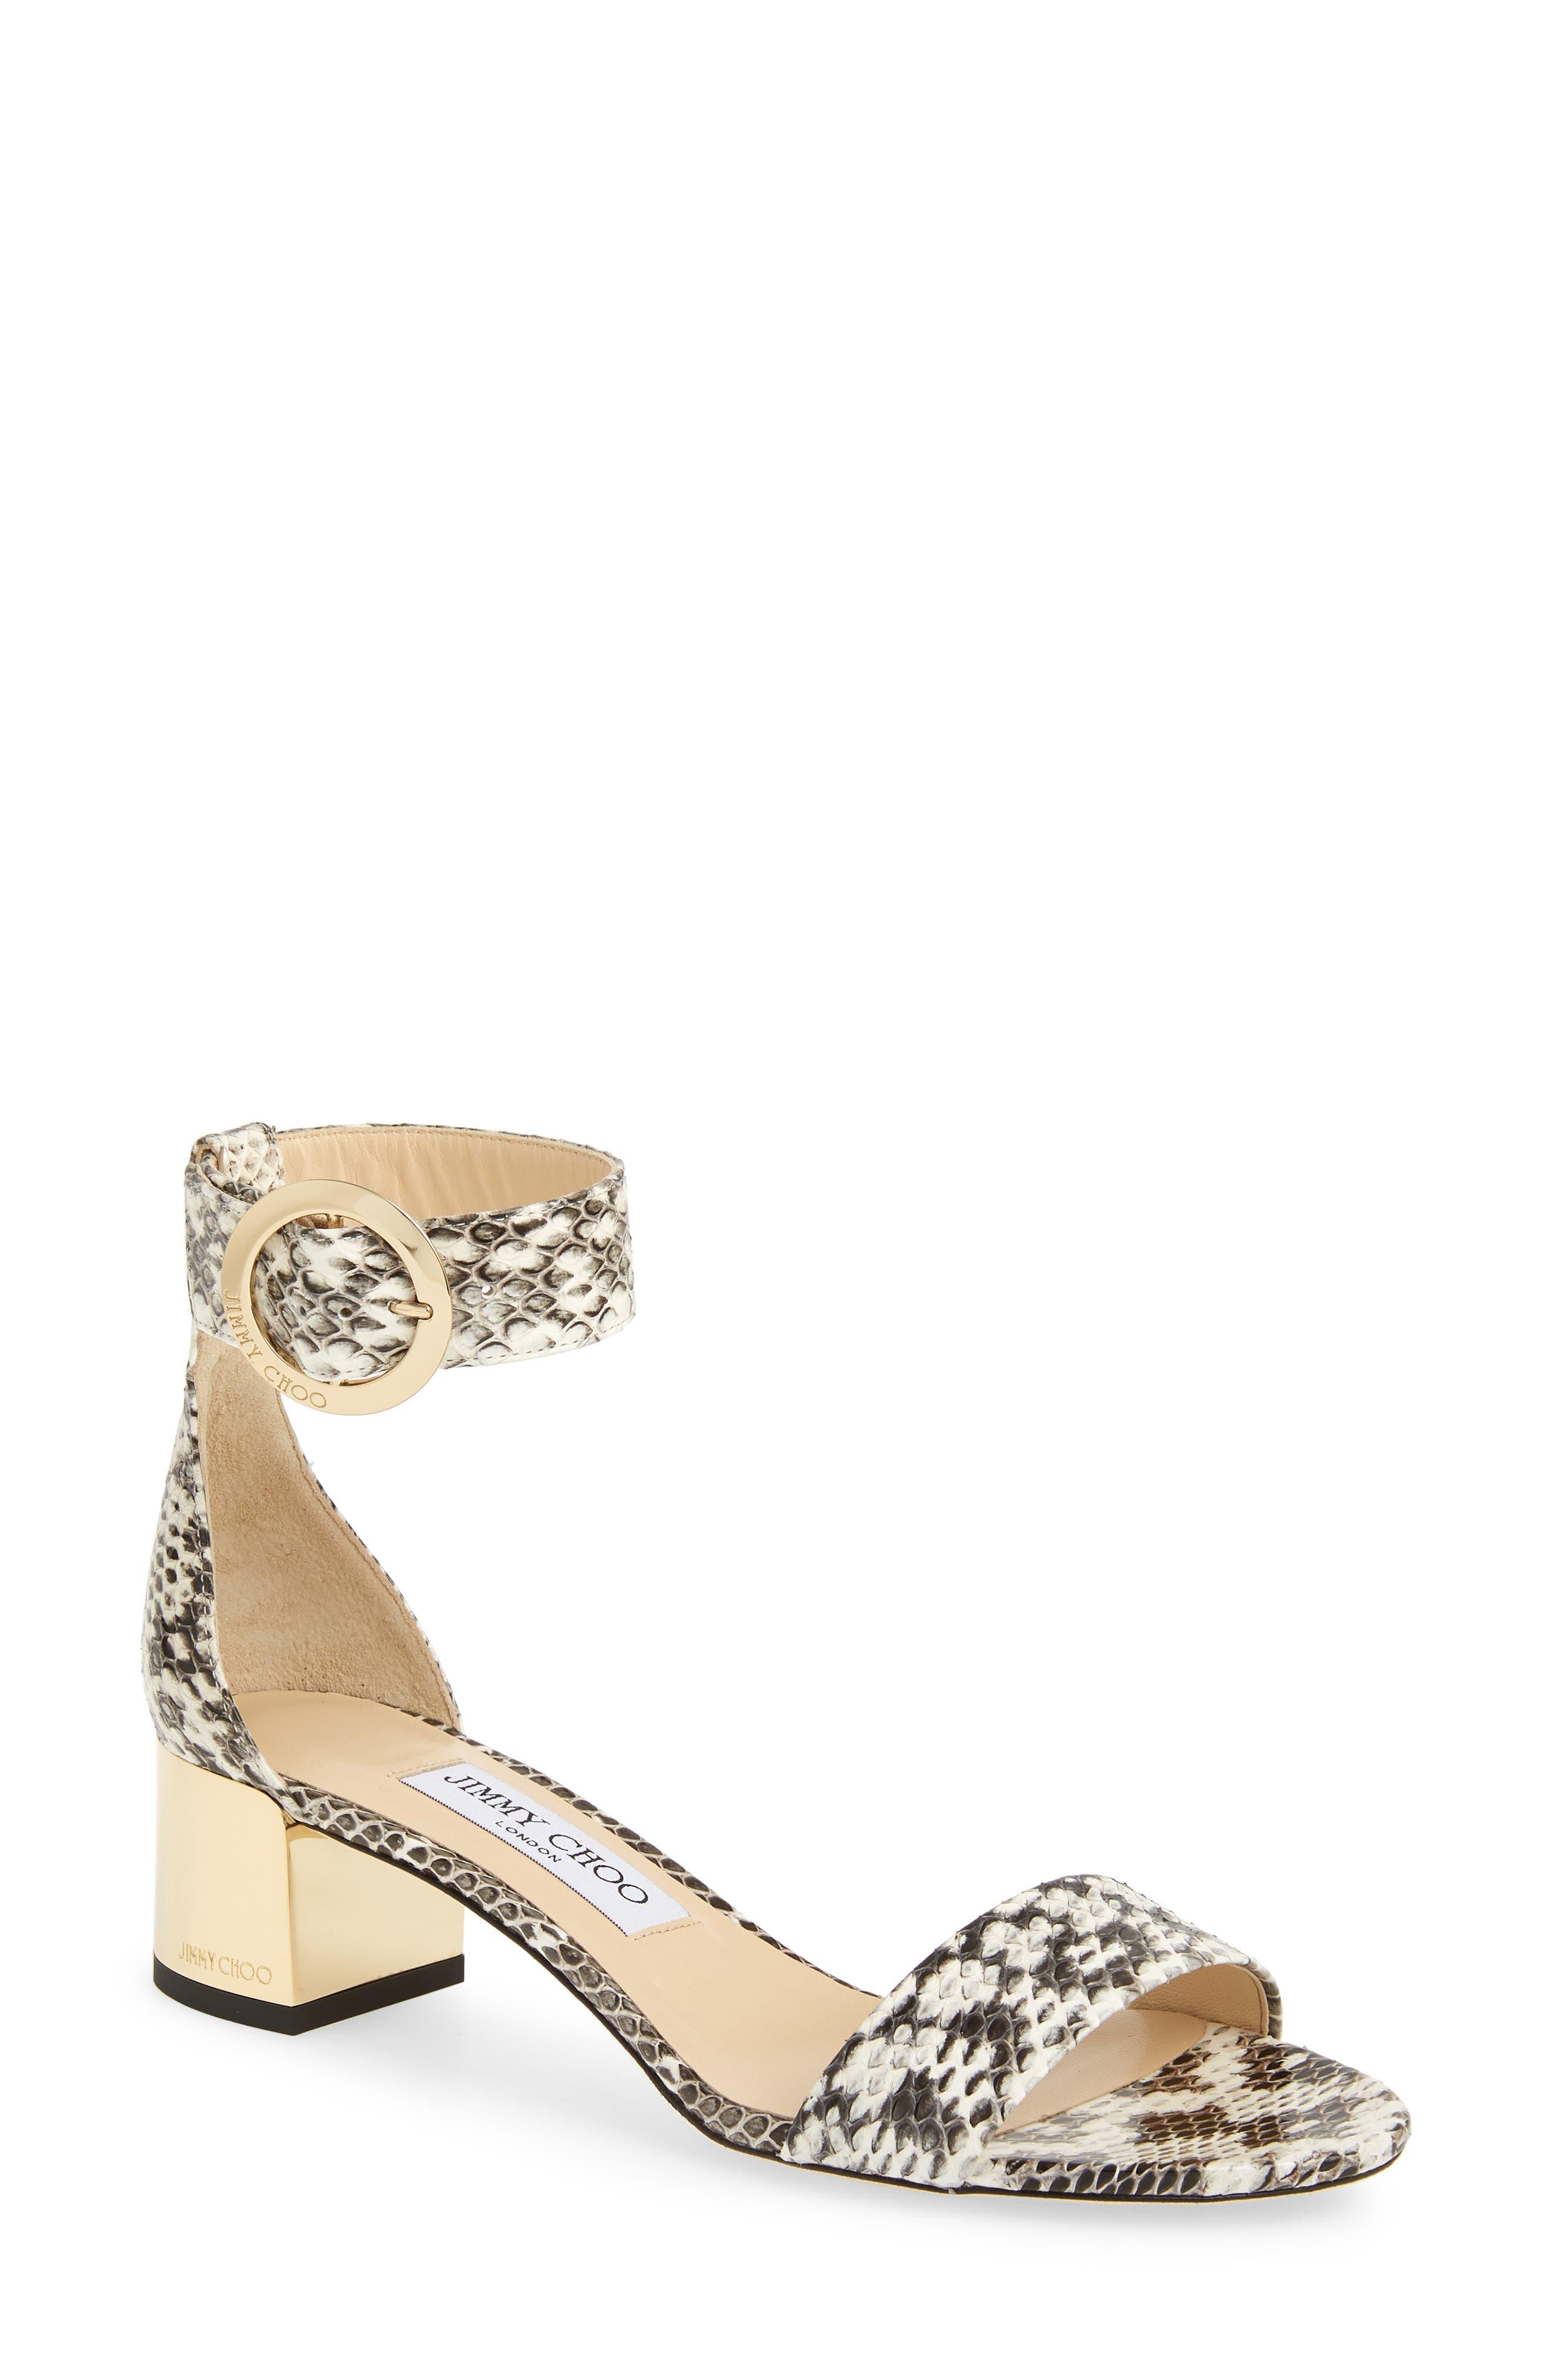 Jimmy Choo Jaimie Genuine Snakeskin Ankle Strap Sandal, Grey